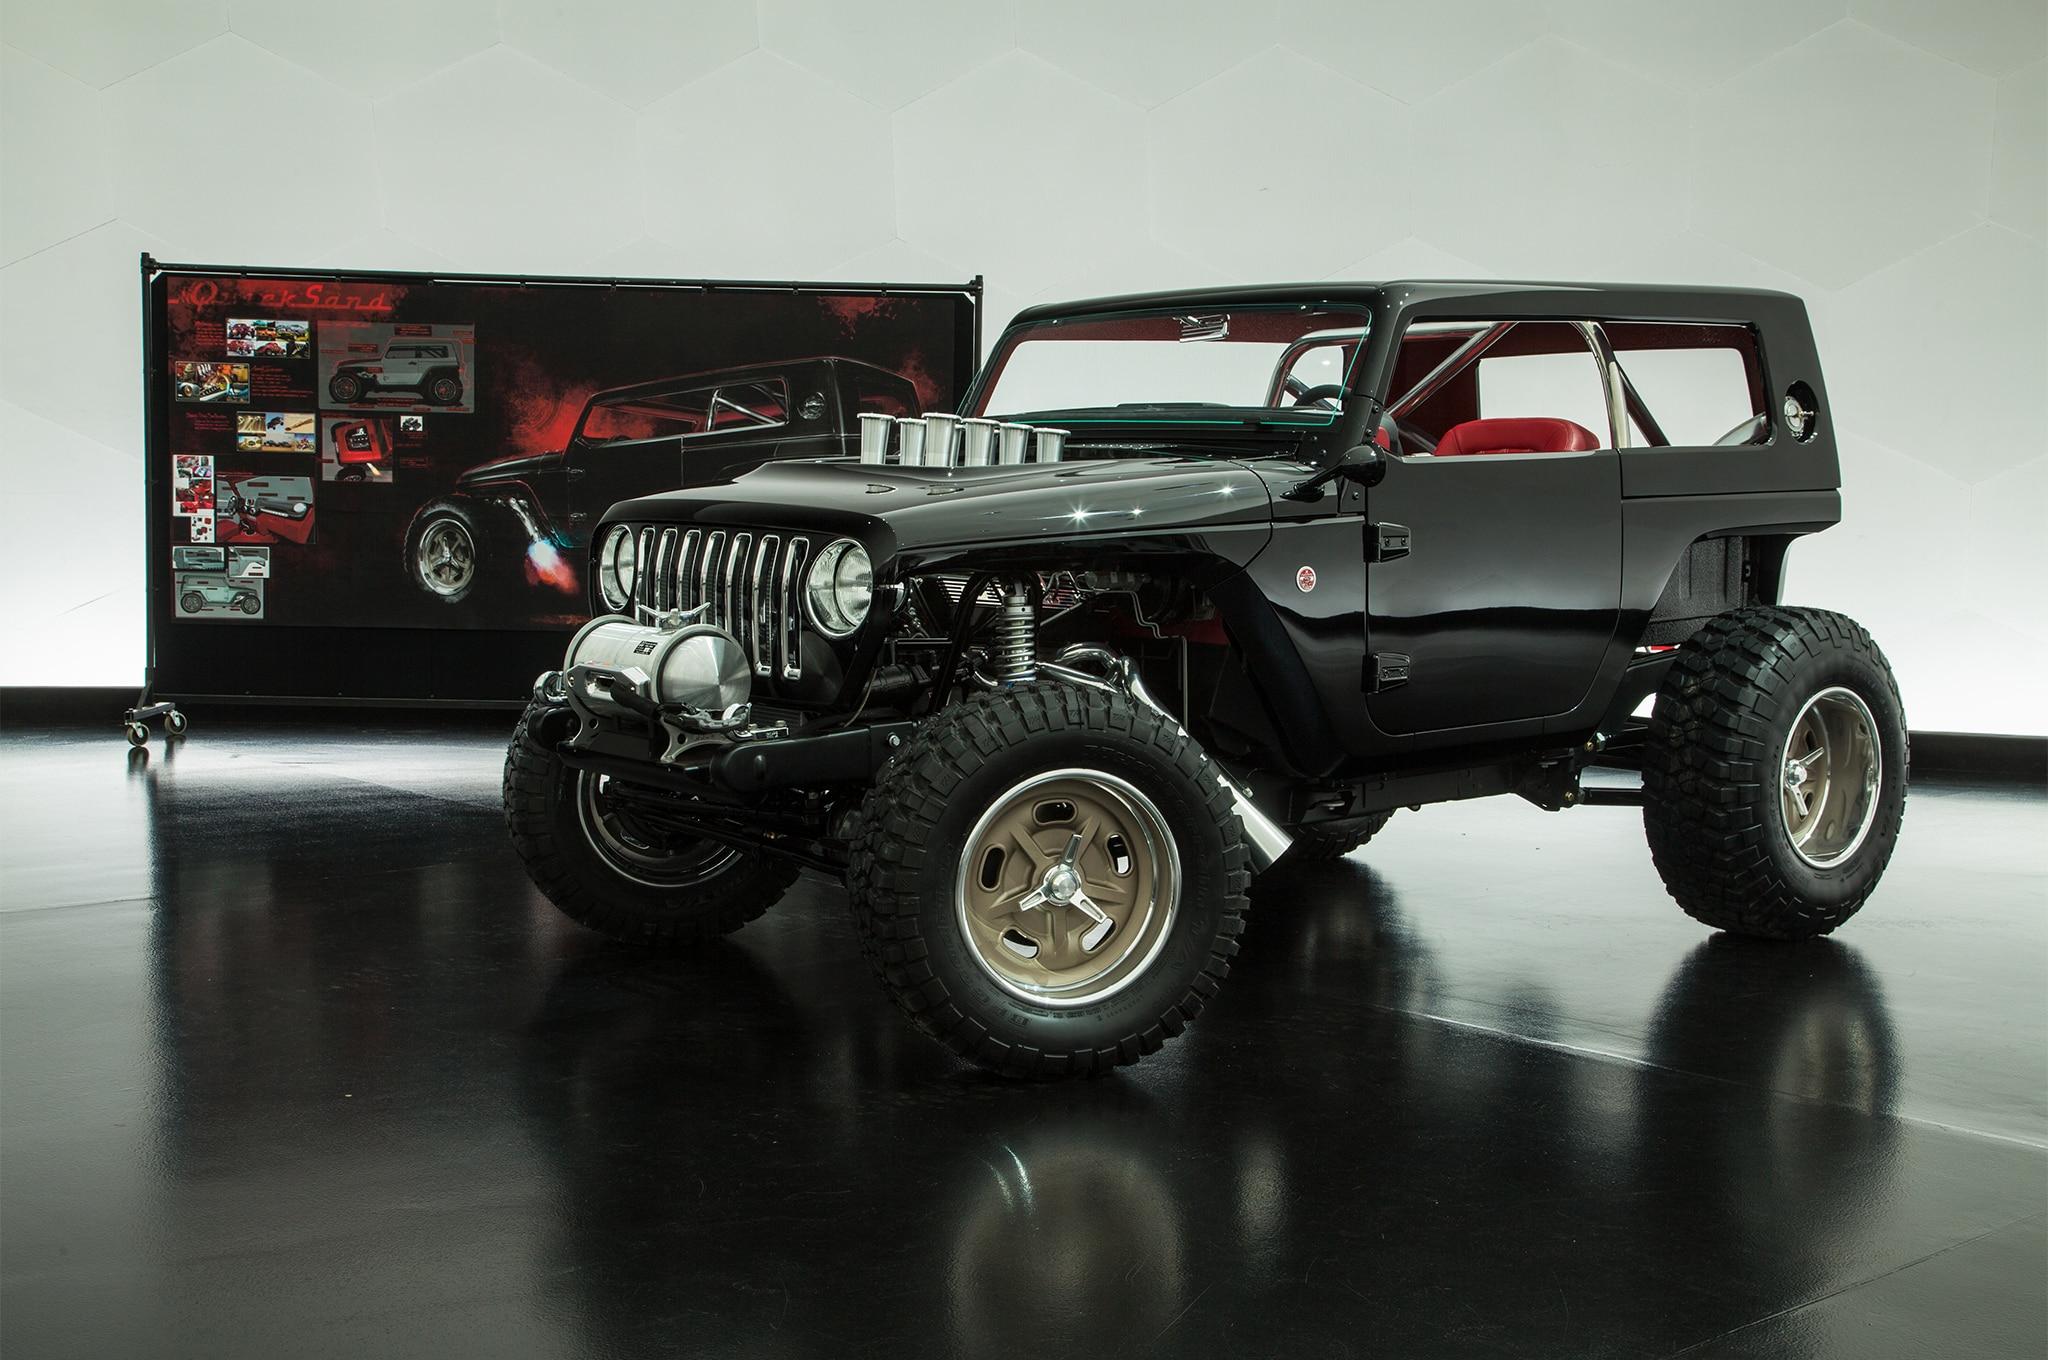 2018 jeep wrangler interior. plain jeep 2017 moab easter jeep safari quicksand concept front three quarter 02 with 2018 jeep wrangler interior